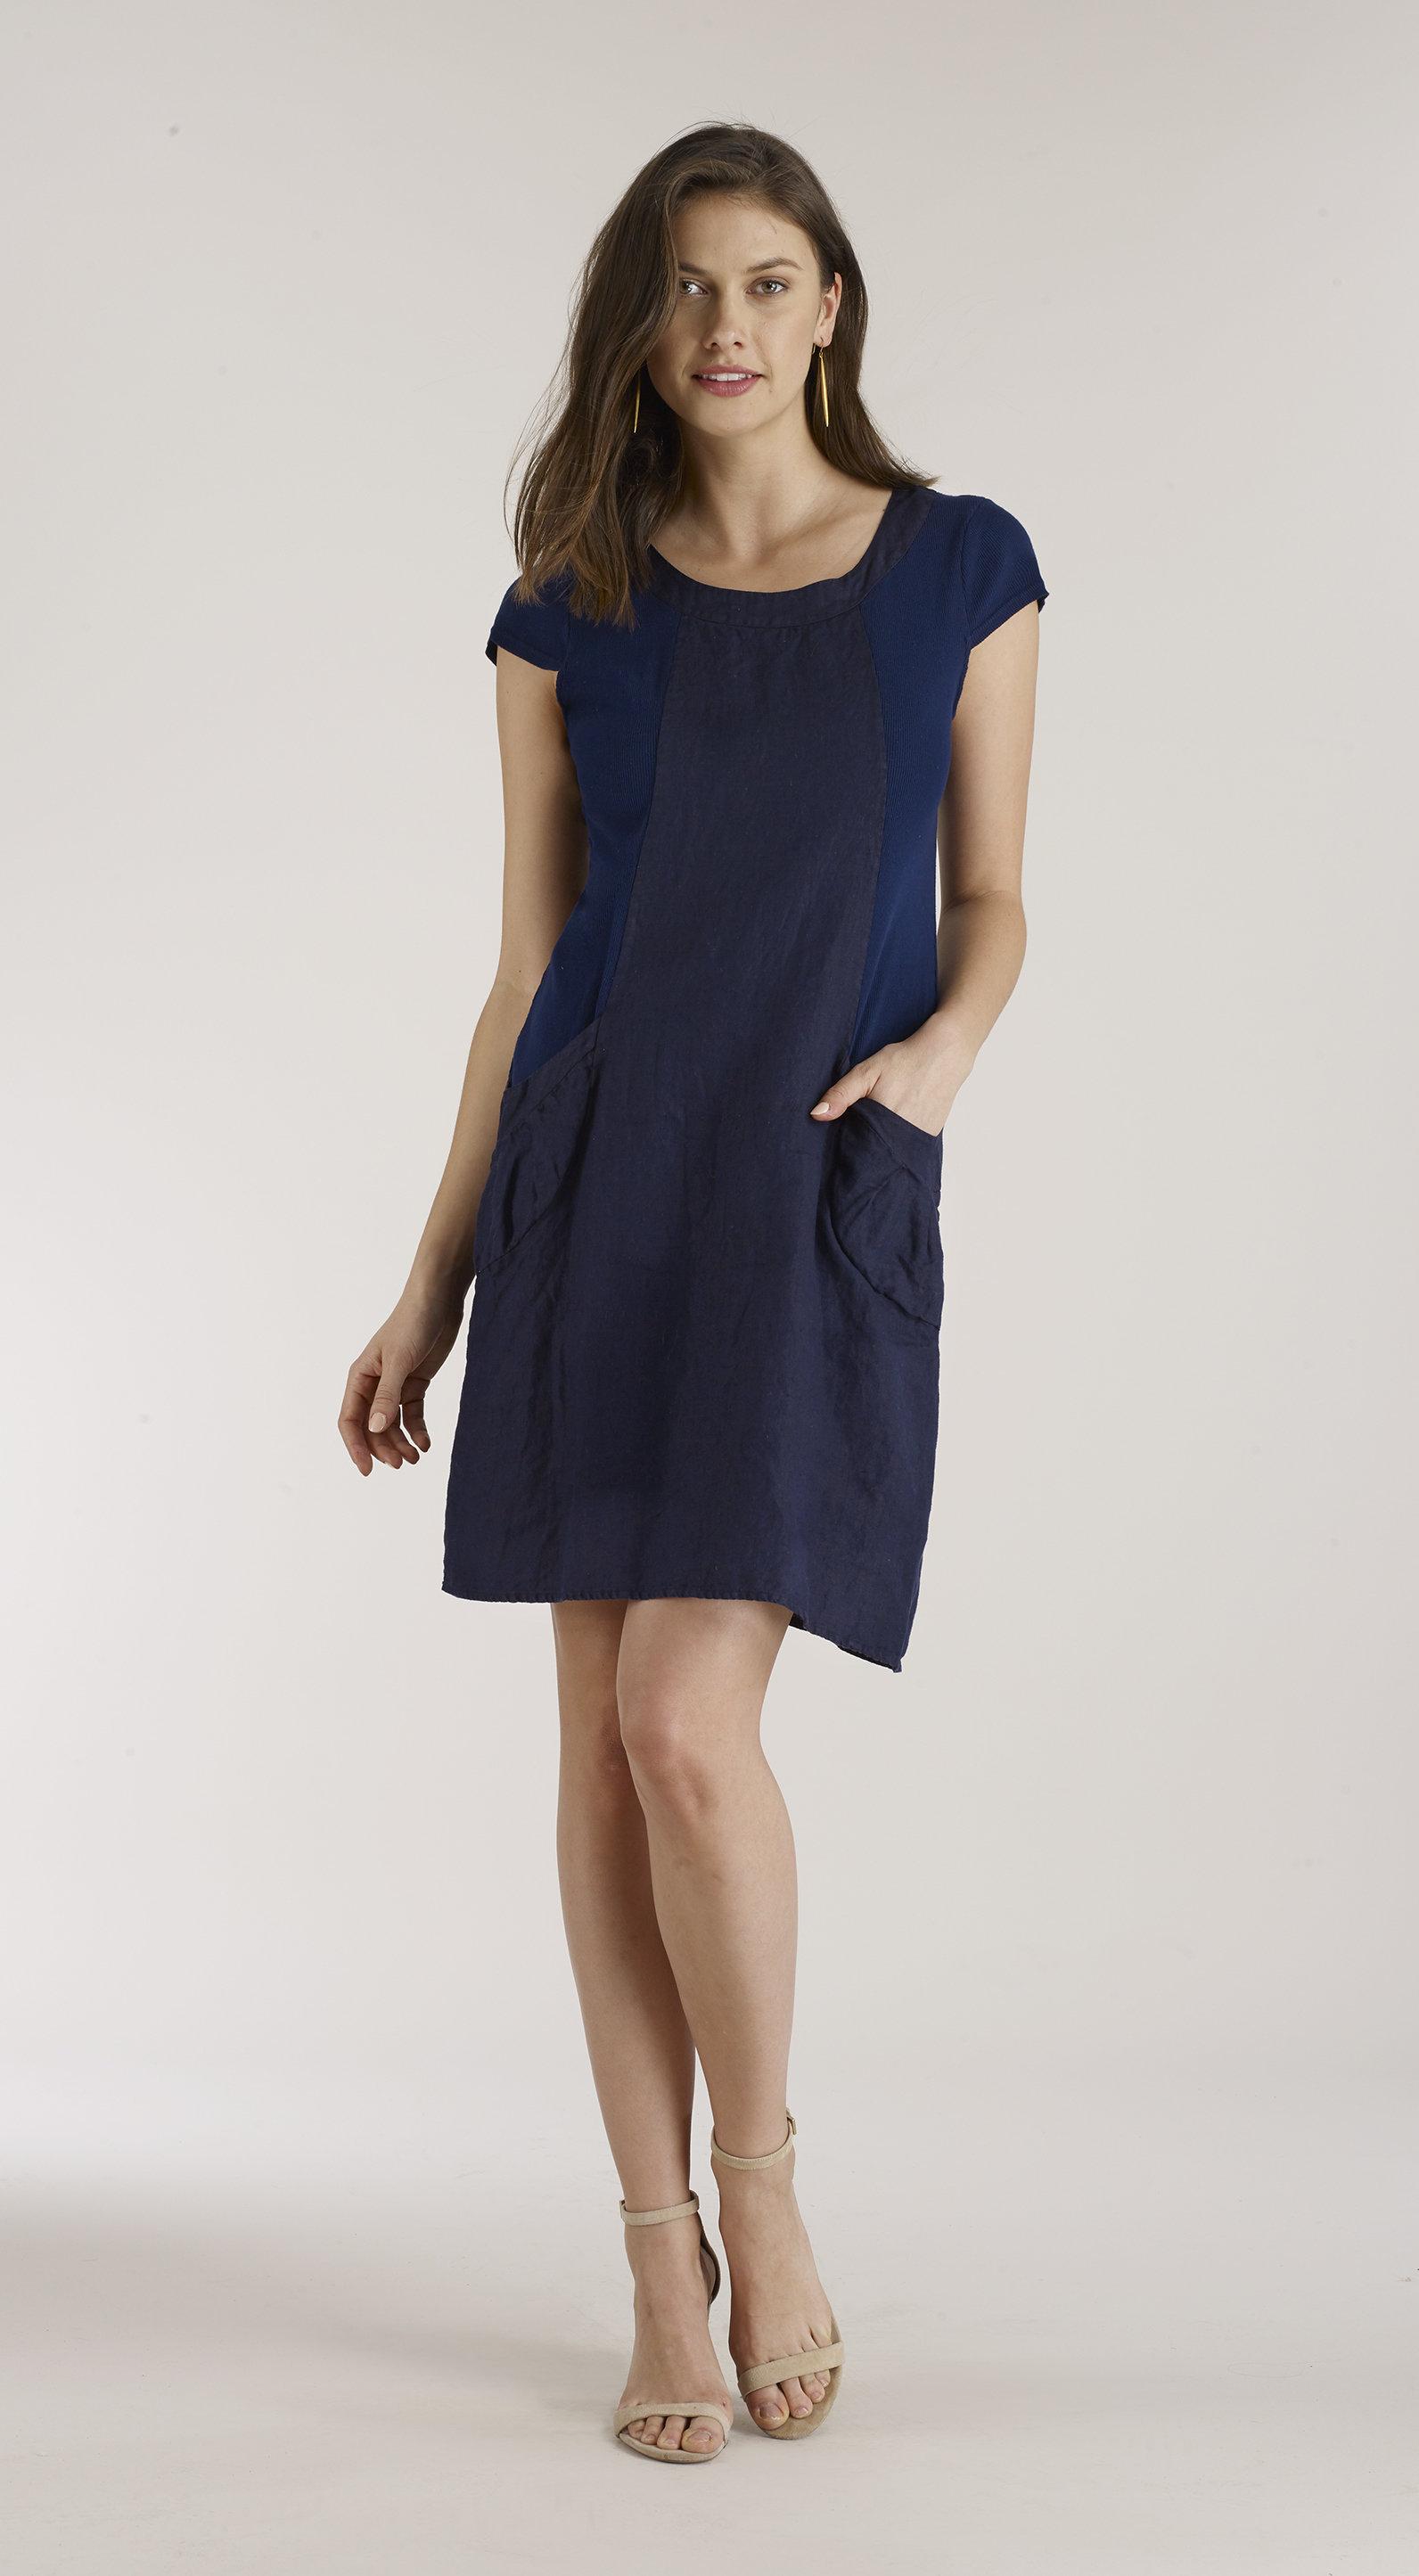 Luna Luz: Ribbed Linen & Cotton Capped Sleeve Dress (Ships Immed, 1 Left!) LL_764_N1